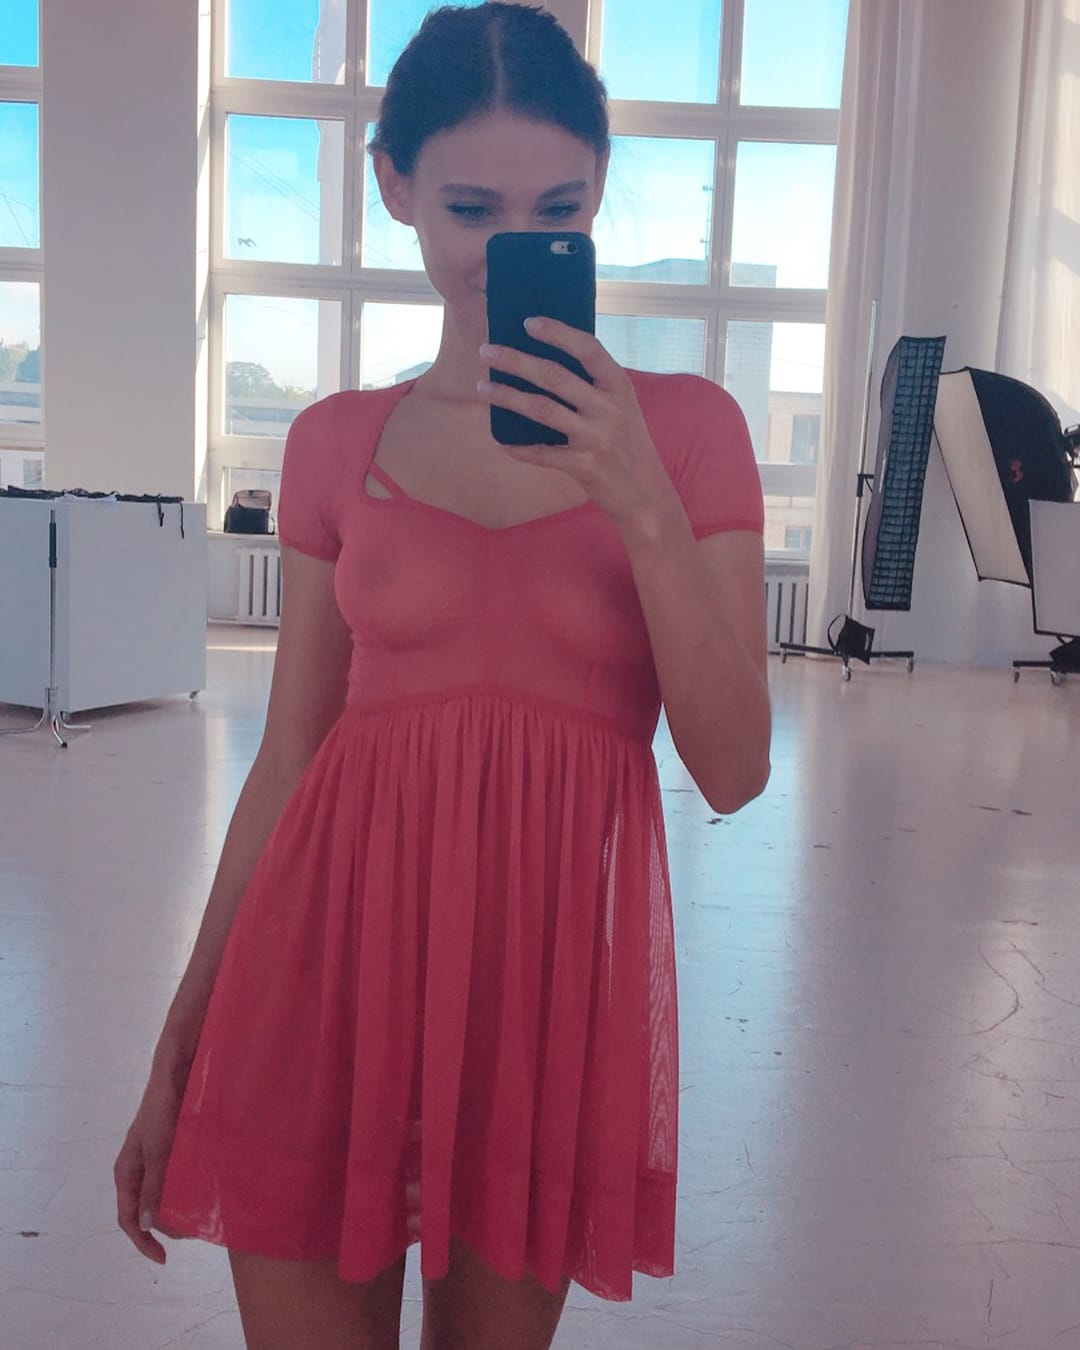 Selfie Ilvy Kokomo nudes (36 photos), Pussy, Hot, Twitter, swimsuit 2017